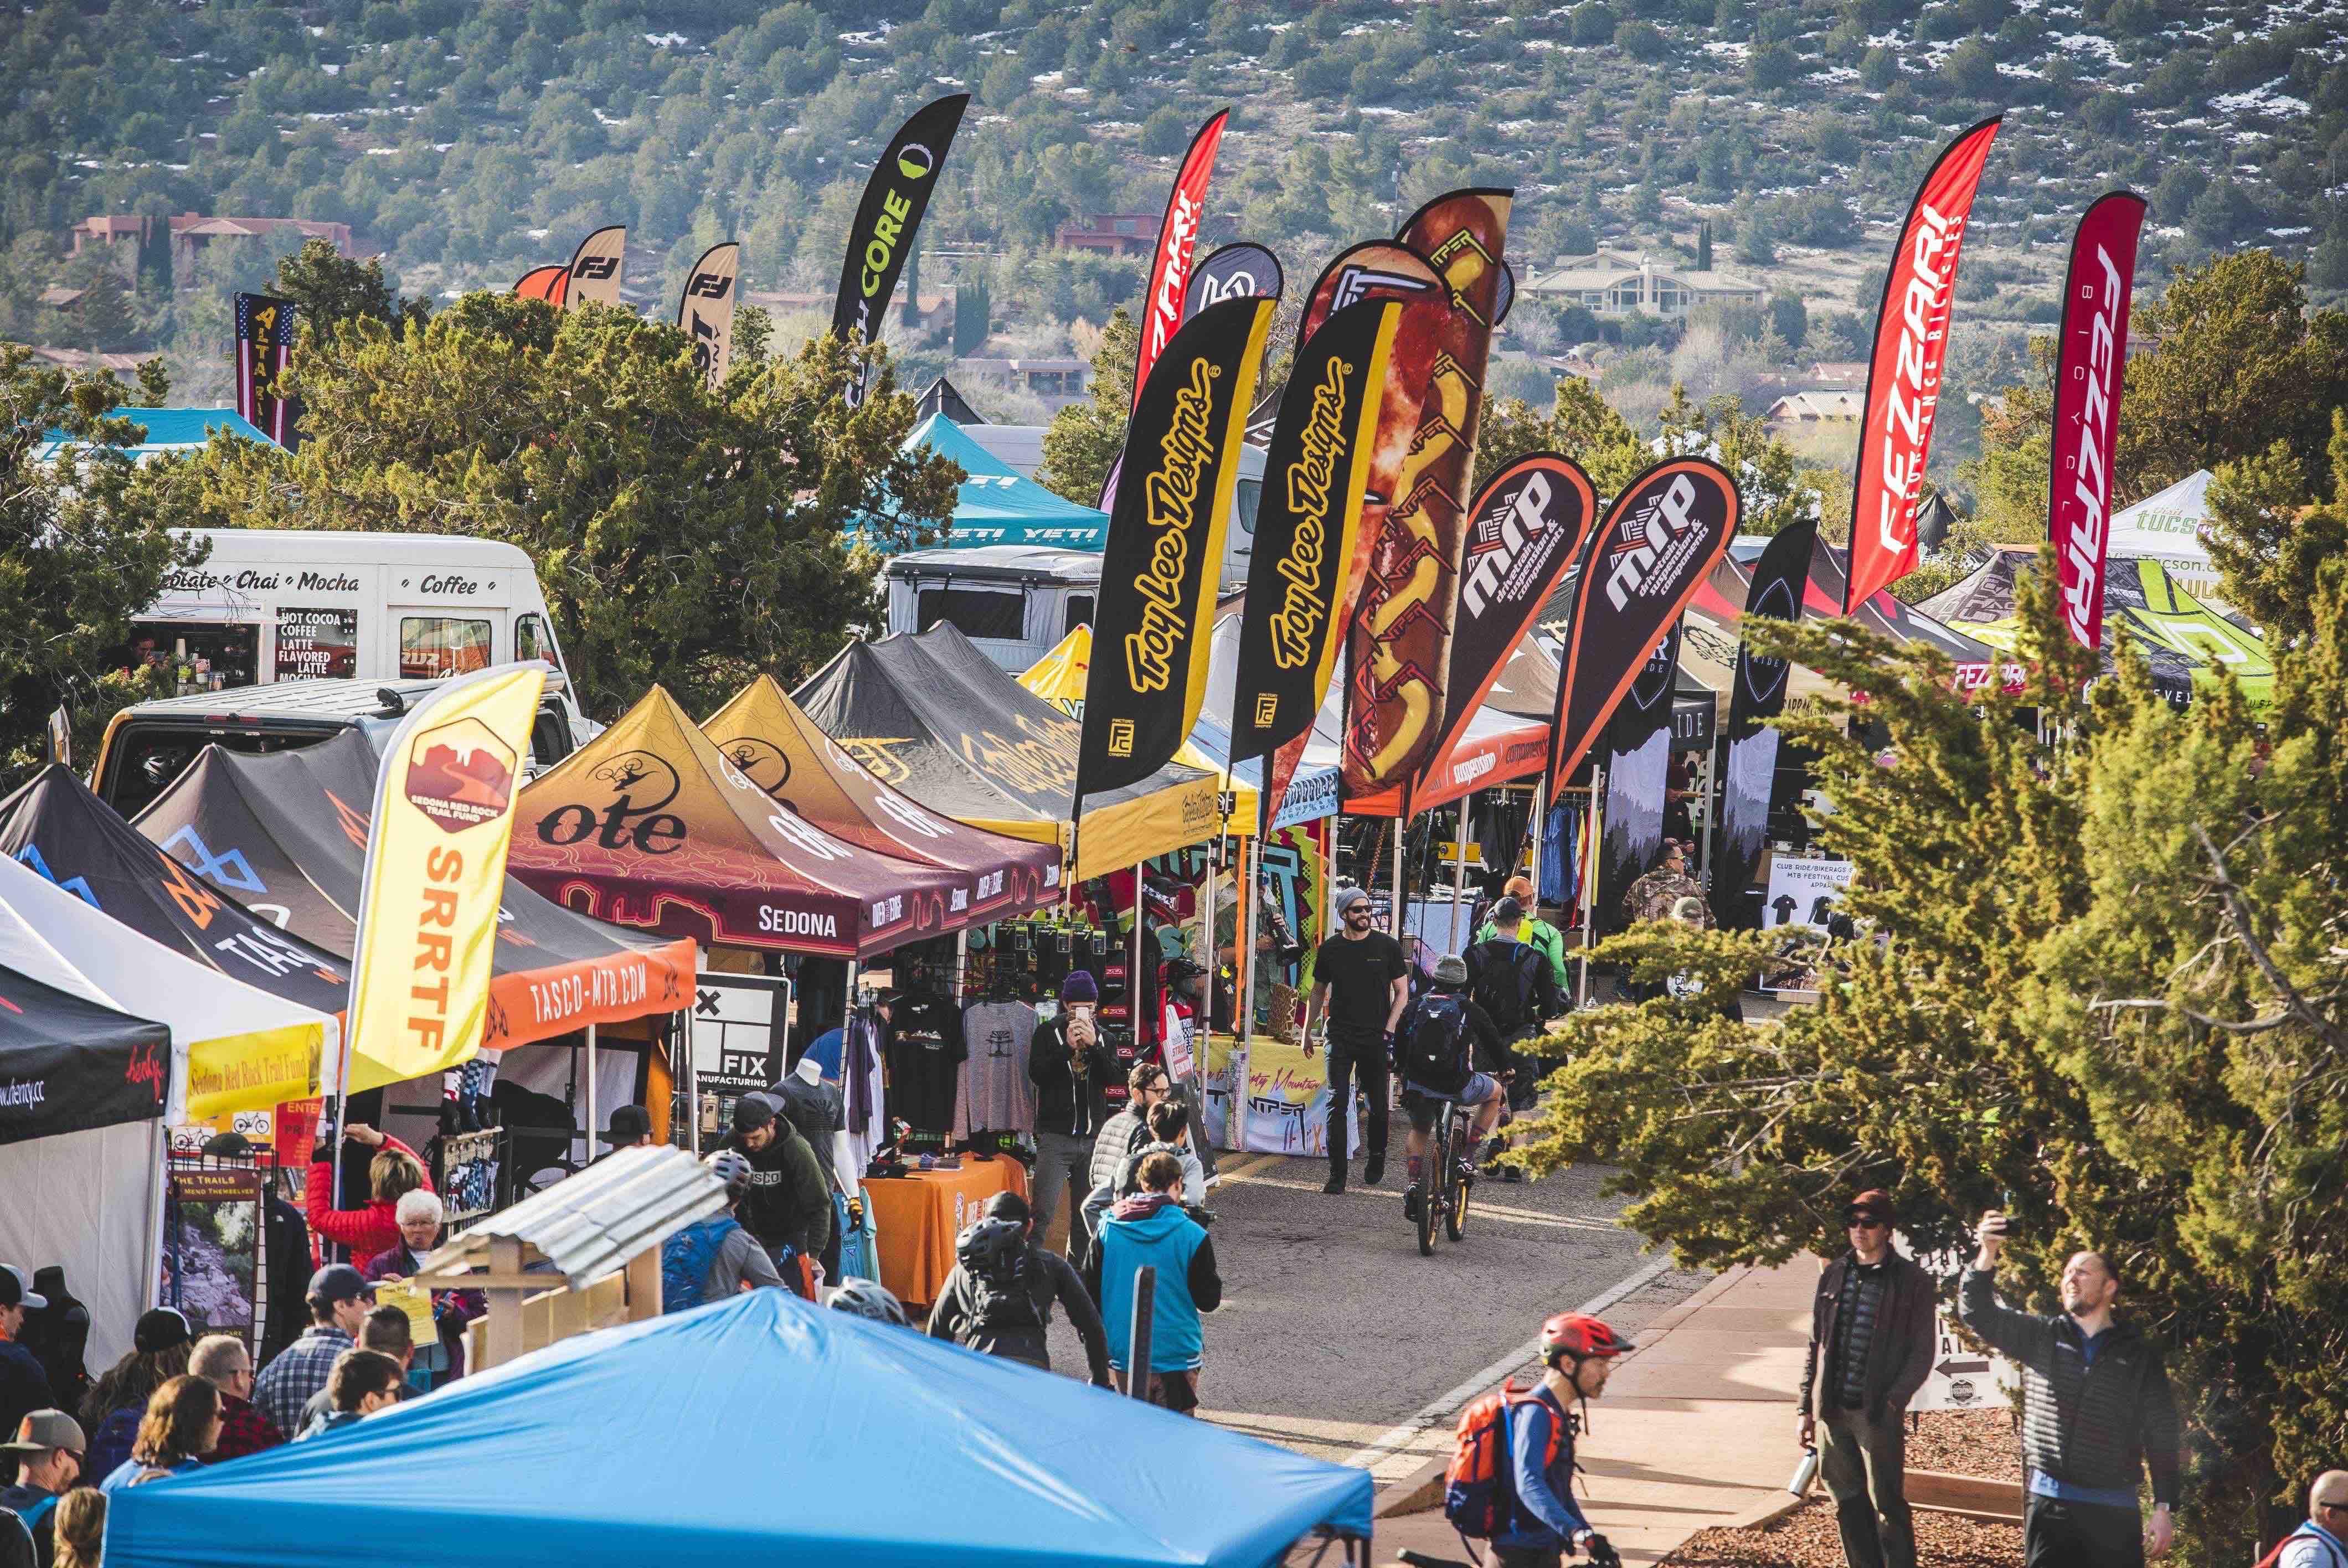 Red Rocks Festival 2020 2020 Sedona Mountain Bike Festival Tickets, Fri, Mar 6, 2020 at 9